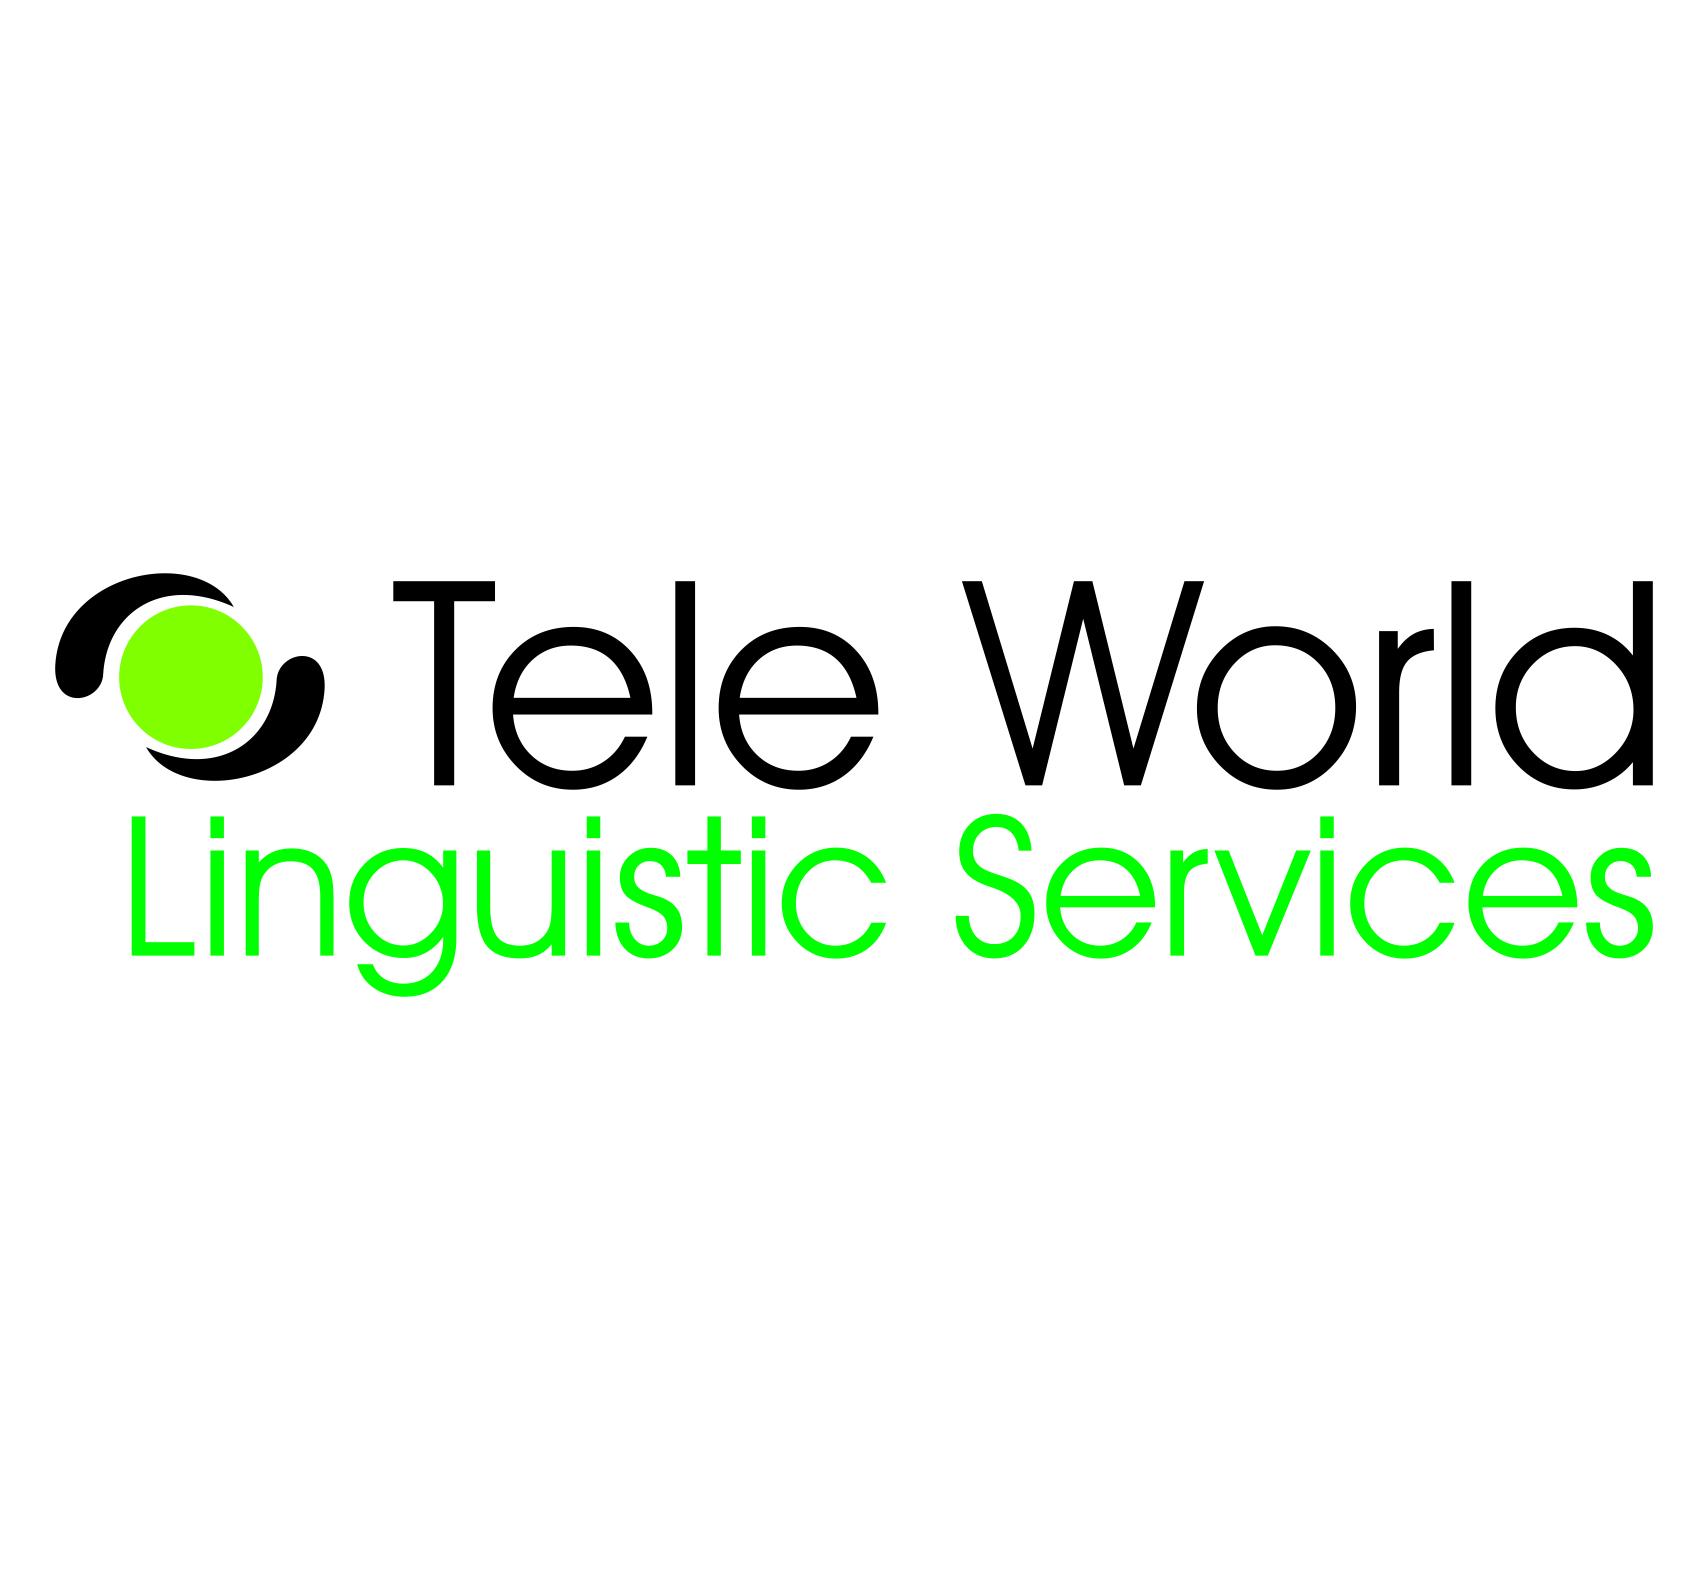 Tele Word Linguistic Services